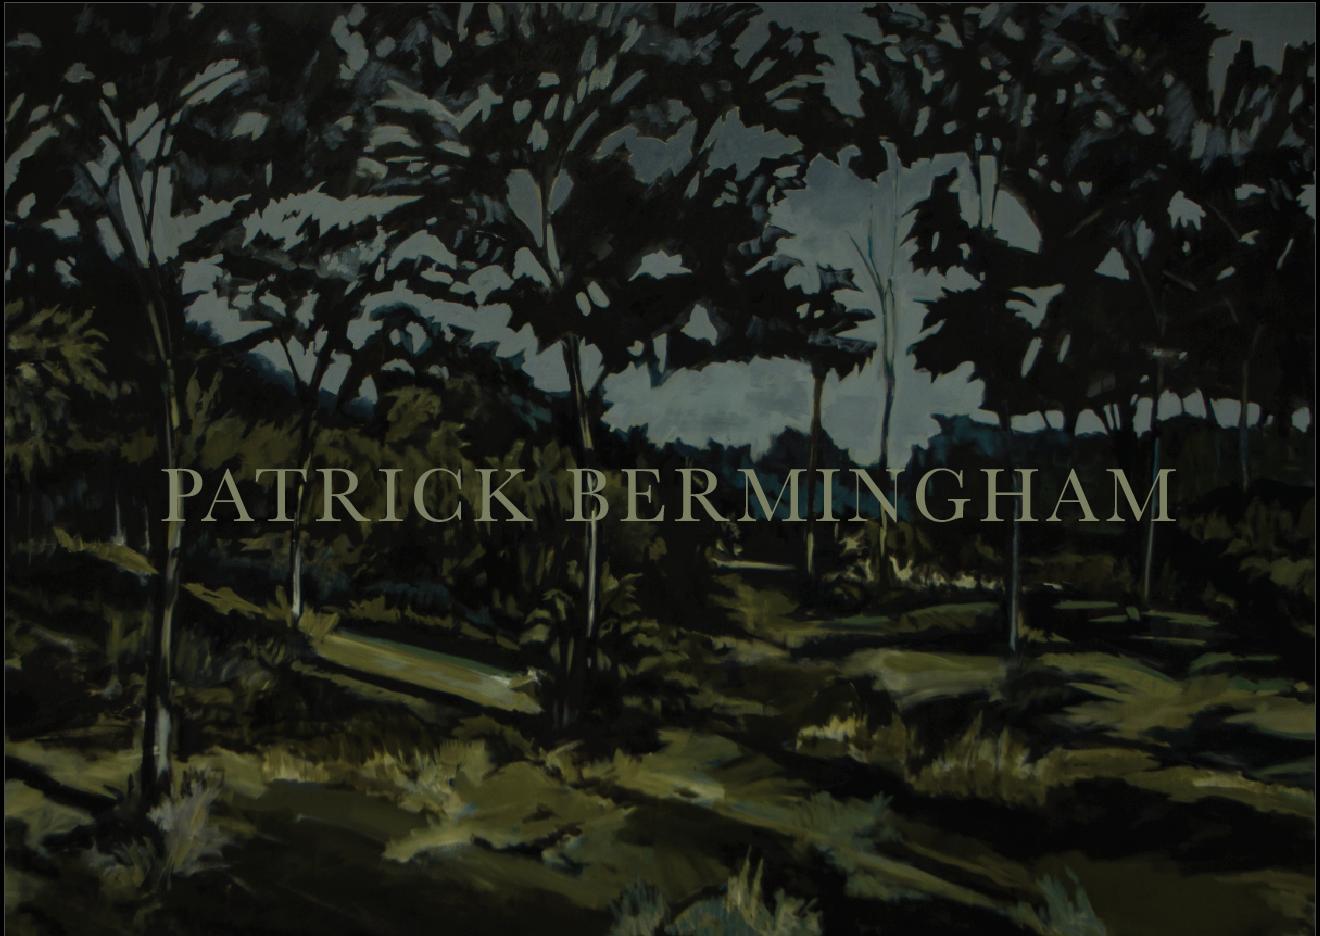 Patricbermingham-f.png